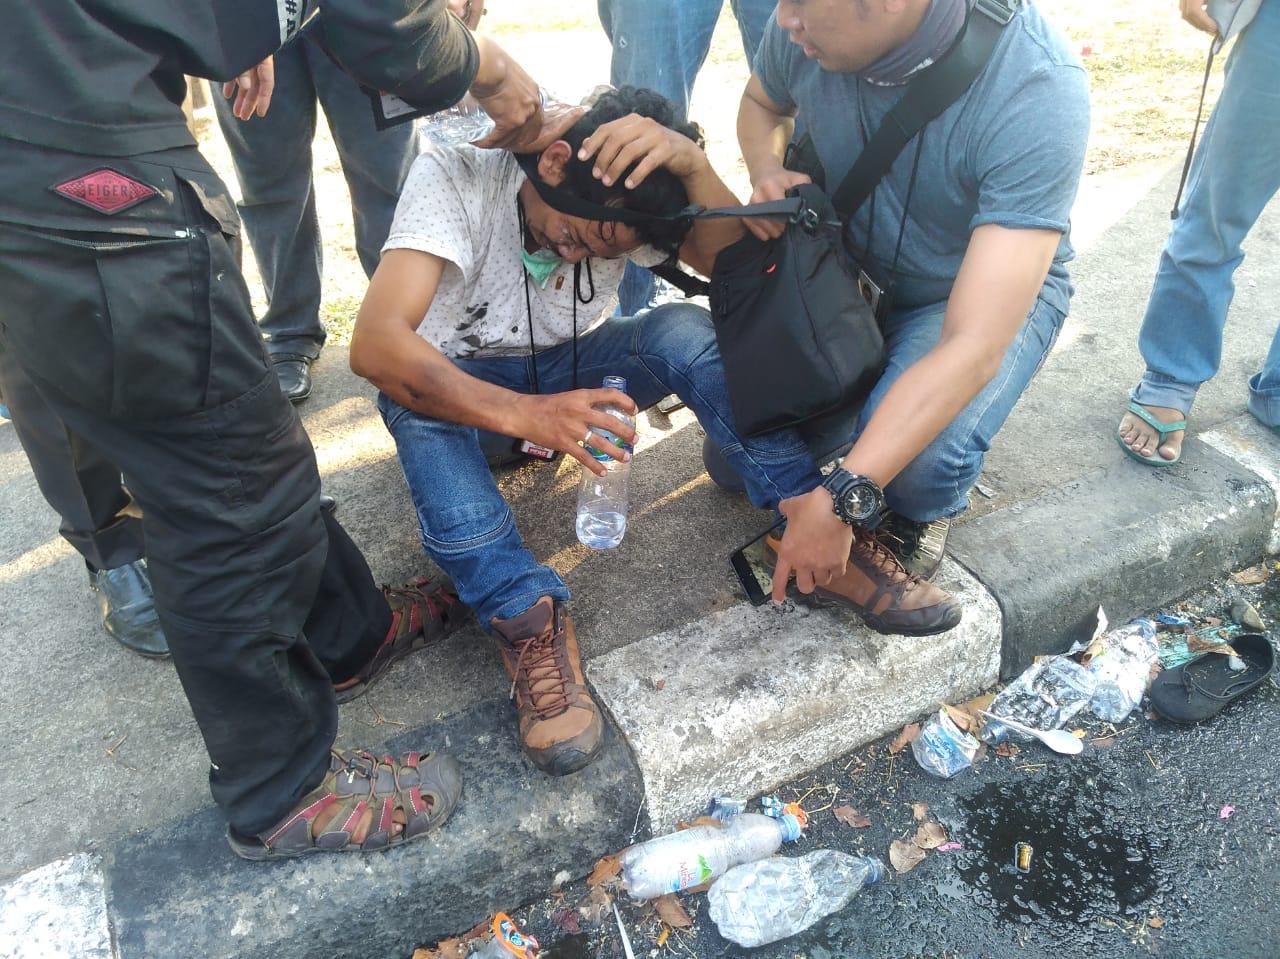 Gambar Cerita Darwin, Korban Penganiayaan Oknum Polisi Saat Meliput Demo